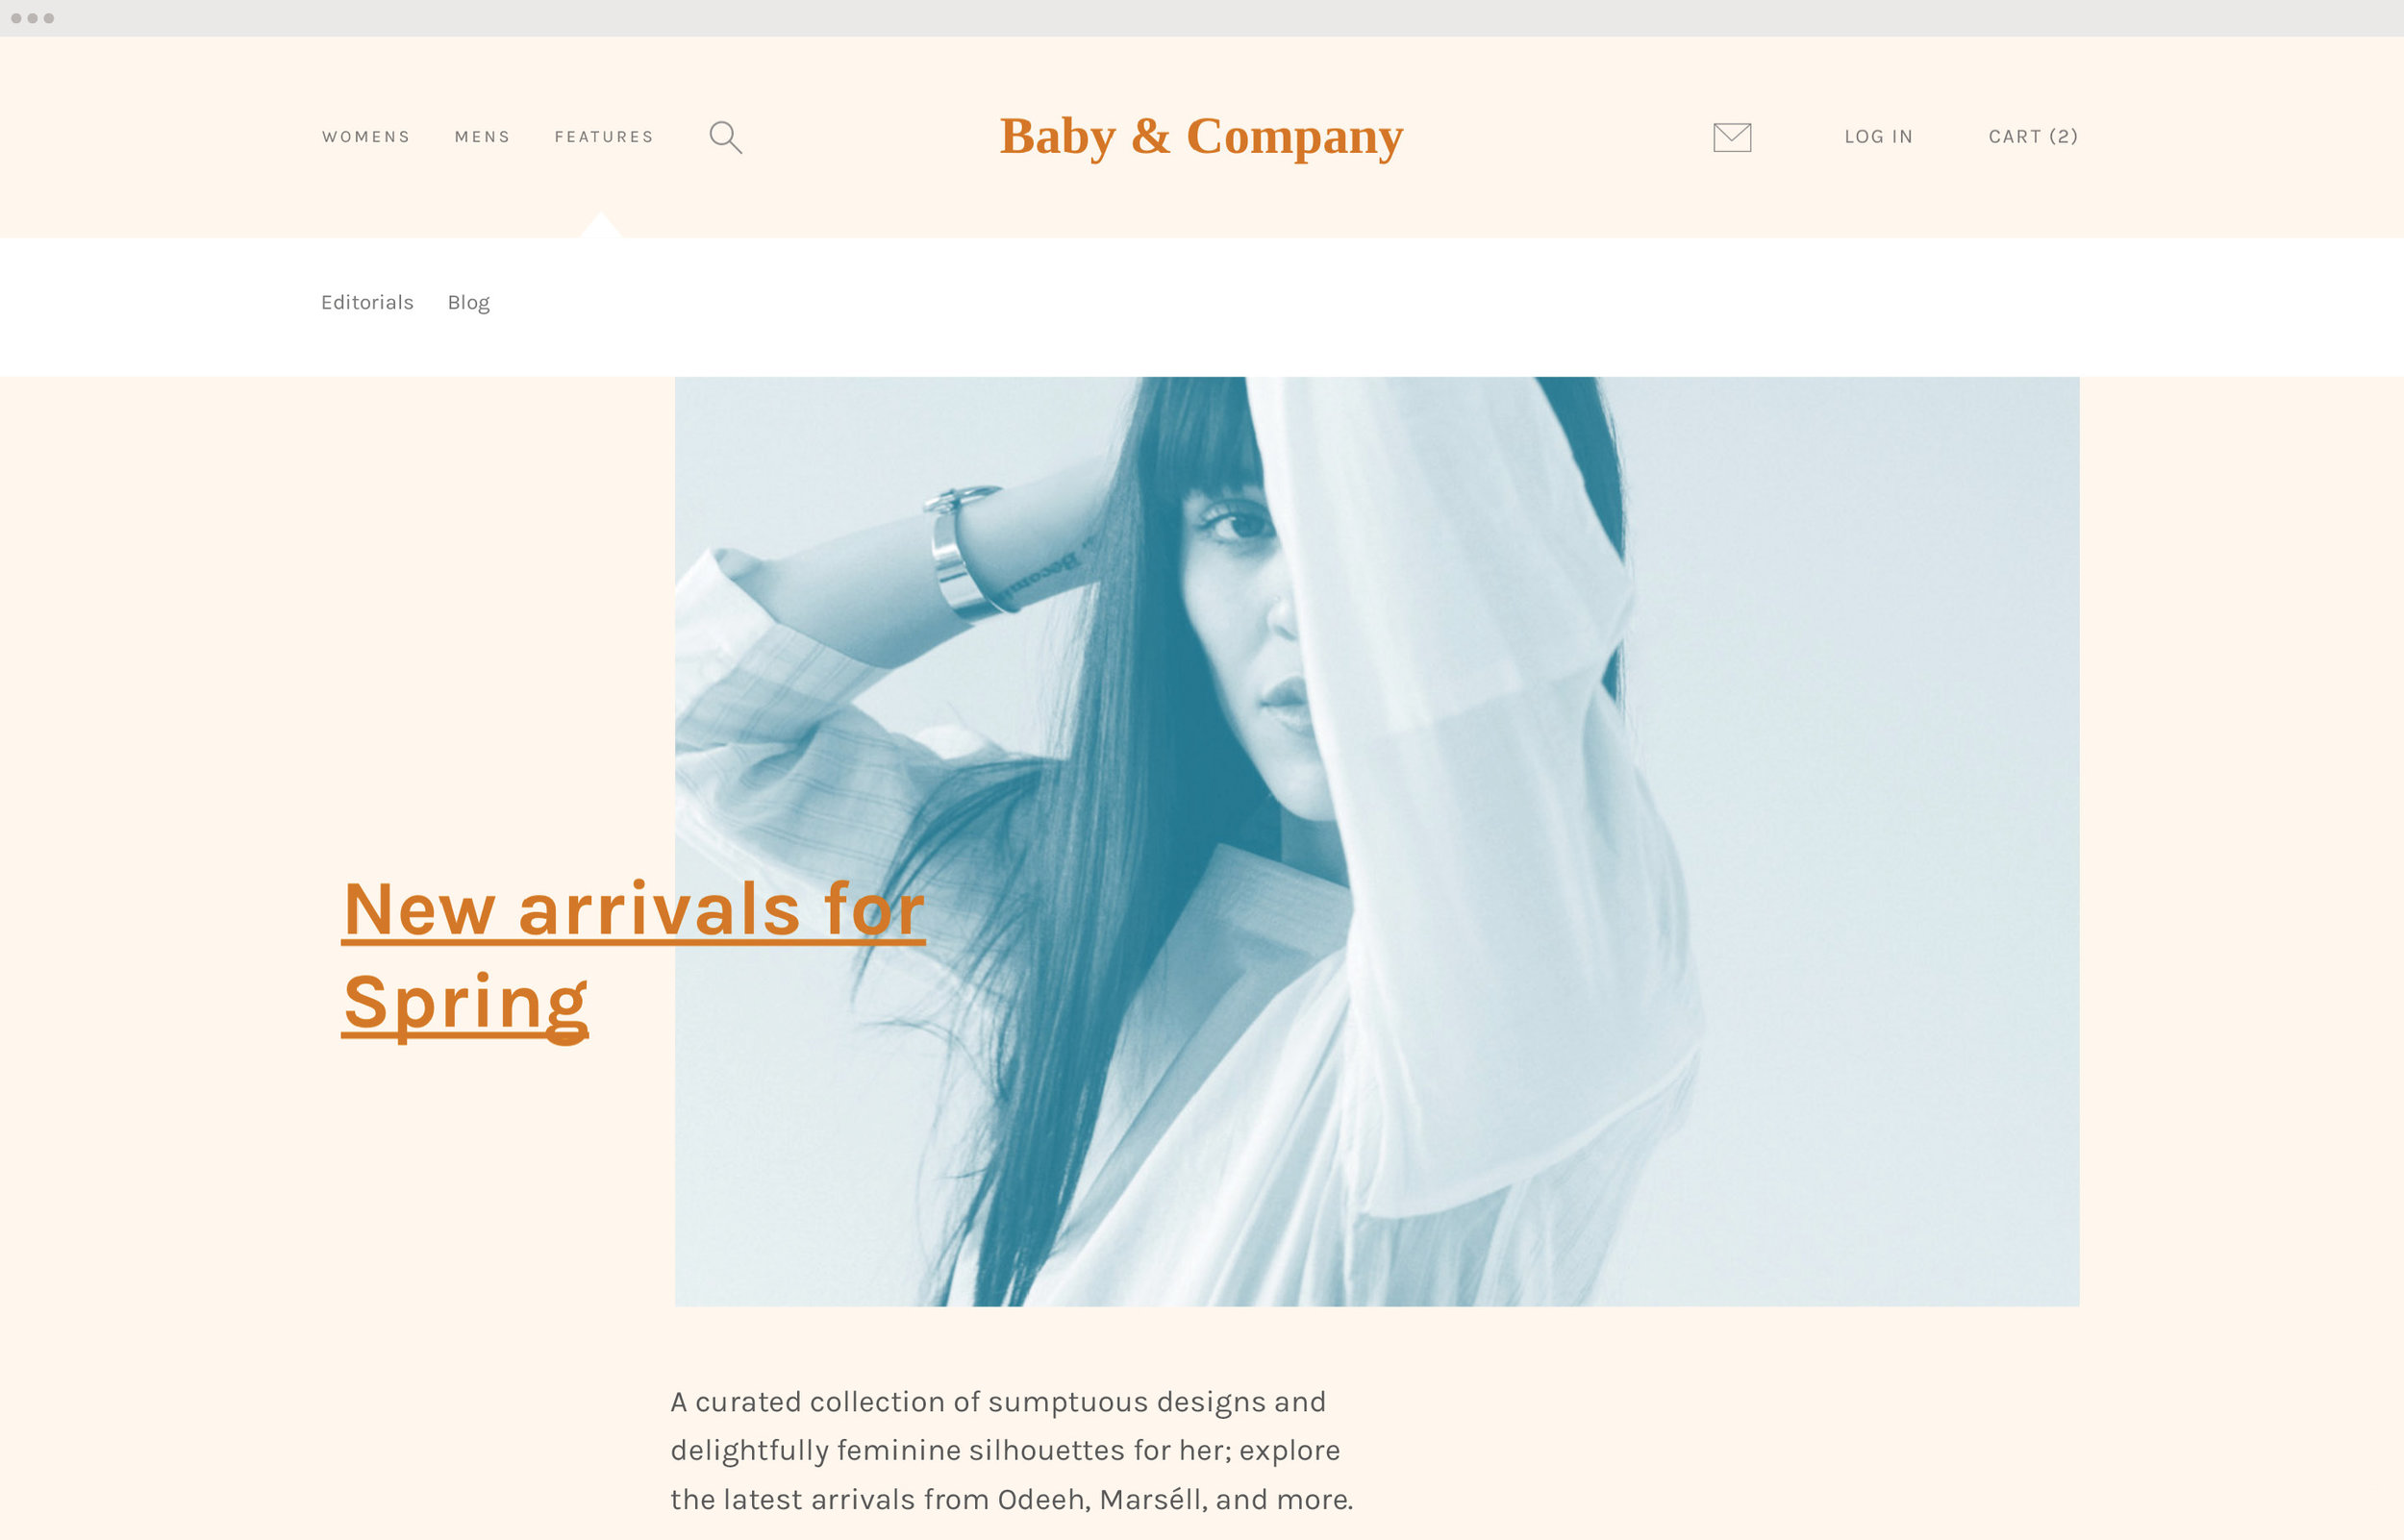 Web Tiles_2019_Web Design - B&C site customization5.jpg